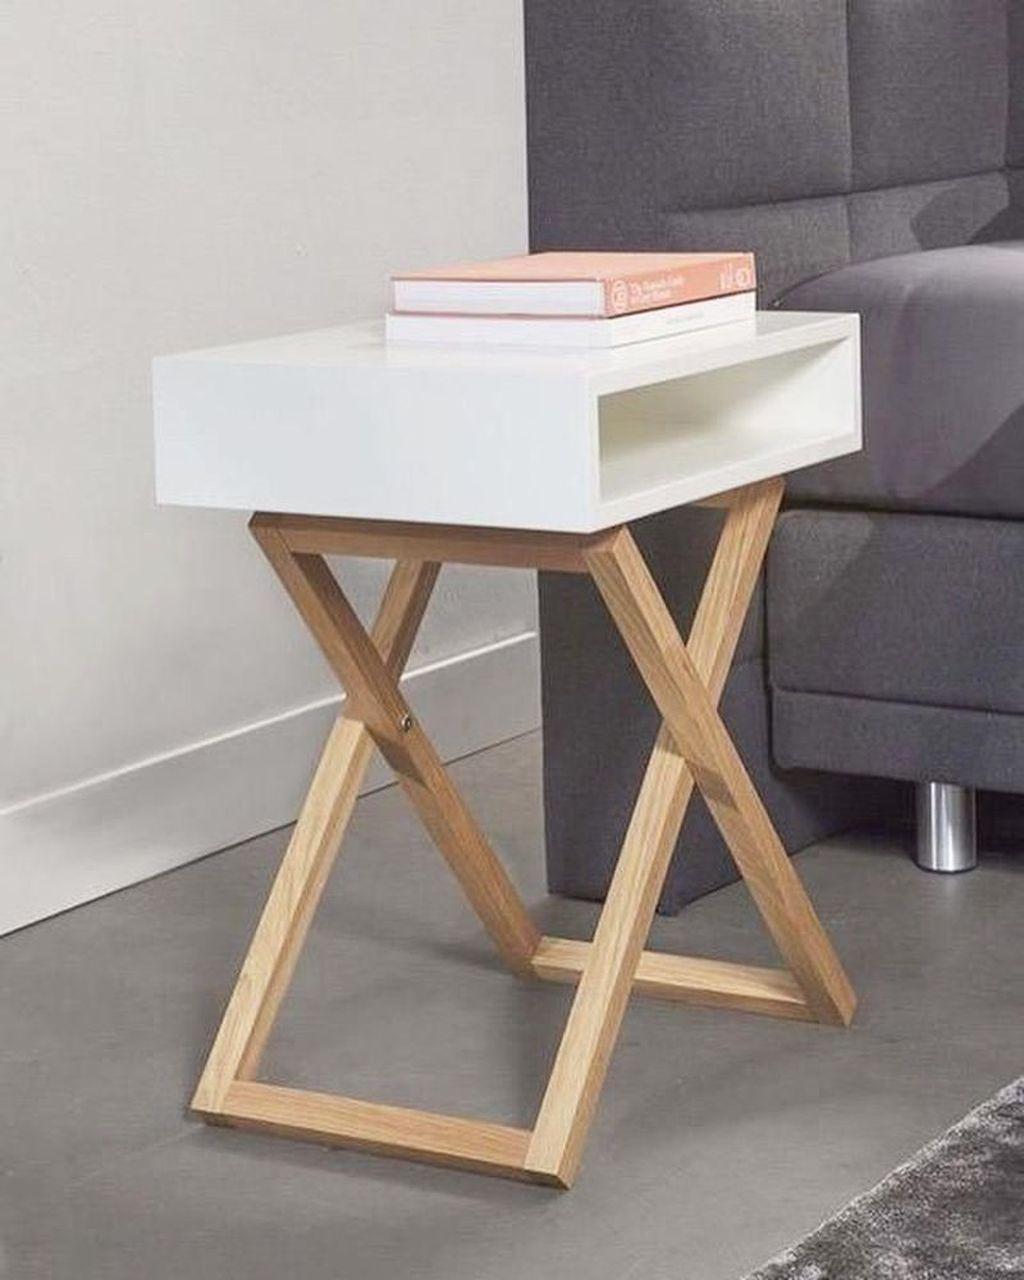 Admirable Minimalist Modern Furniture Design Ideas 05